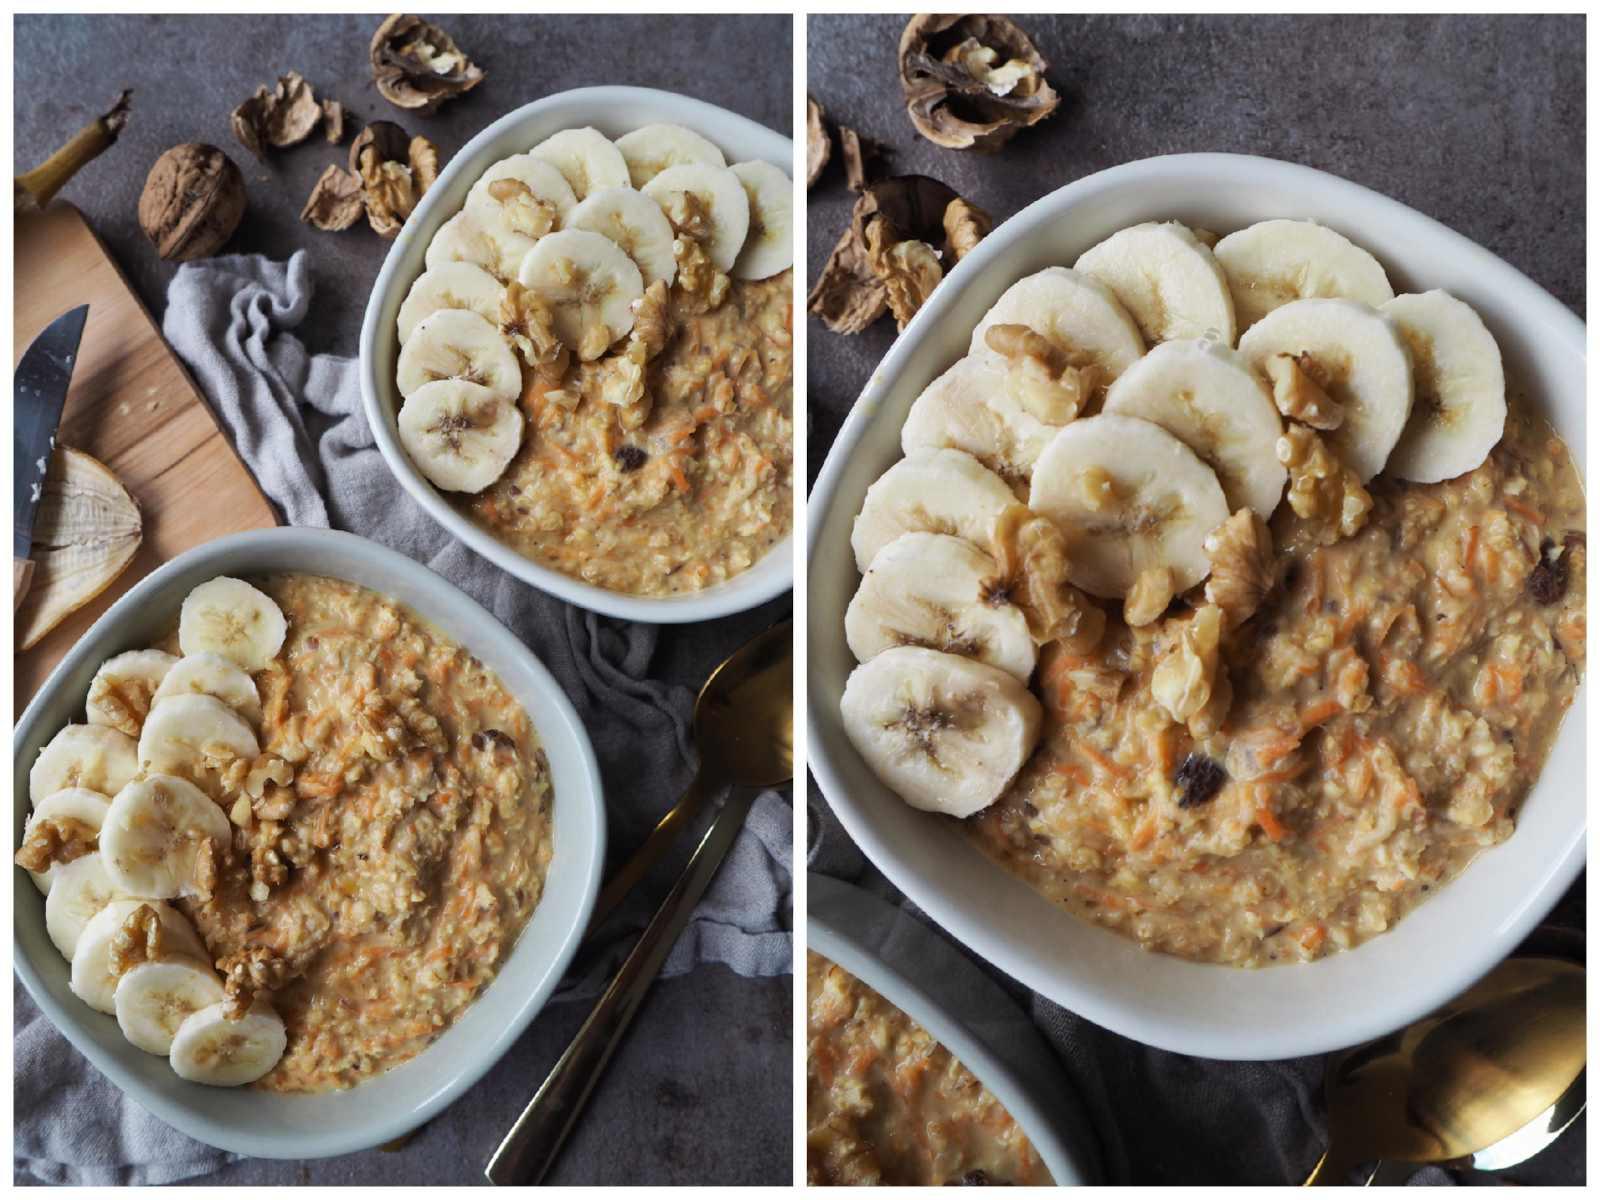 Veganes Apfel-Möhren-Porridge mit Ingwer Details